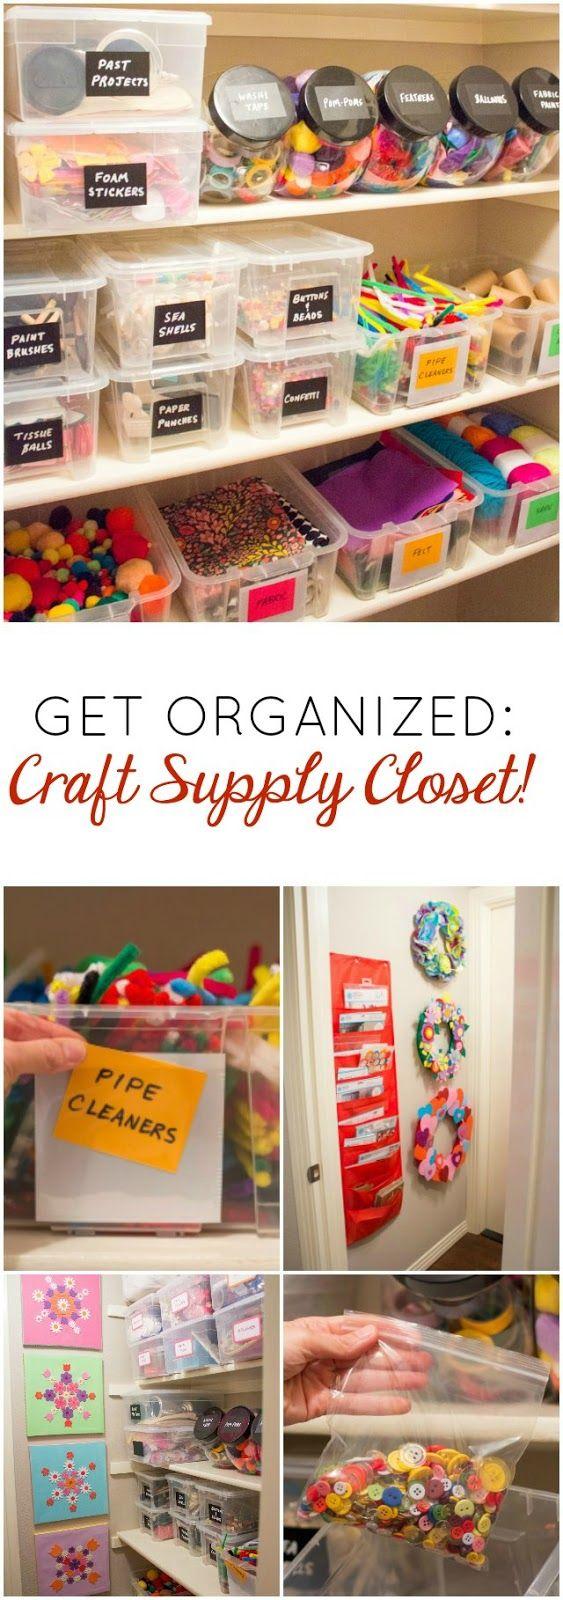 Craft closet storage - Love This Organized Craft Supply Closet